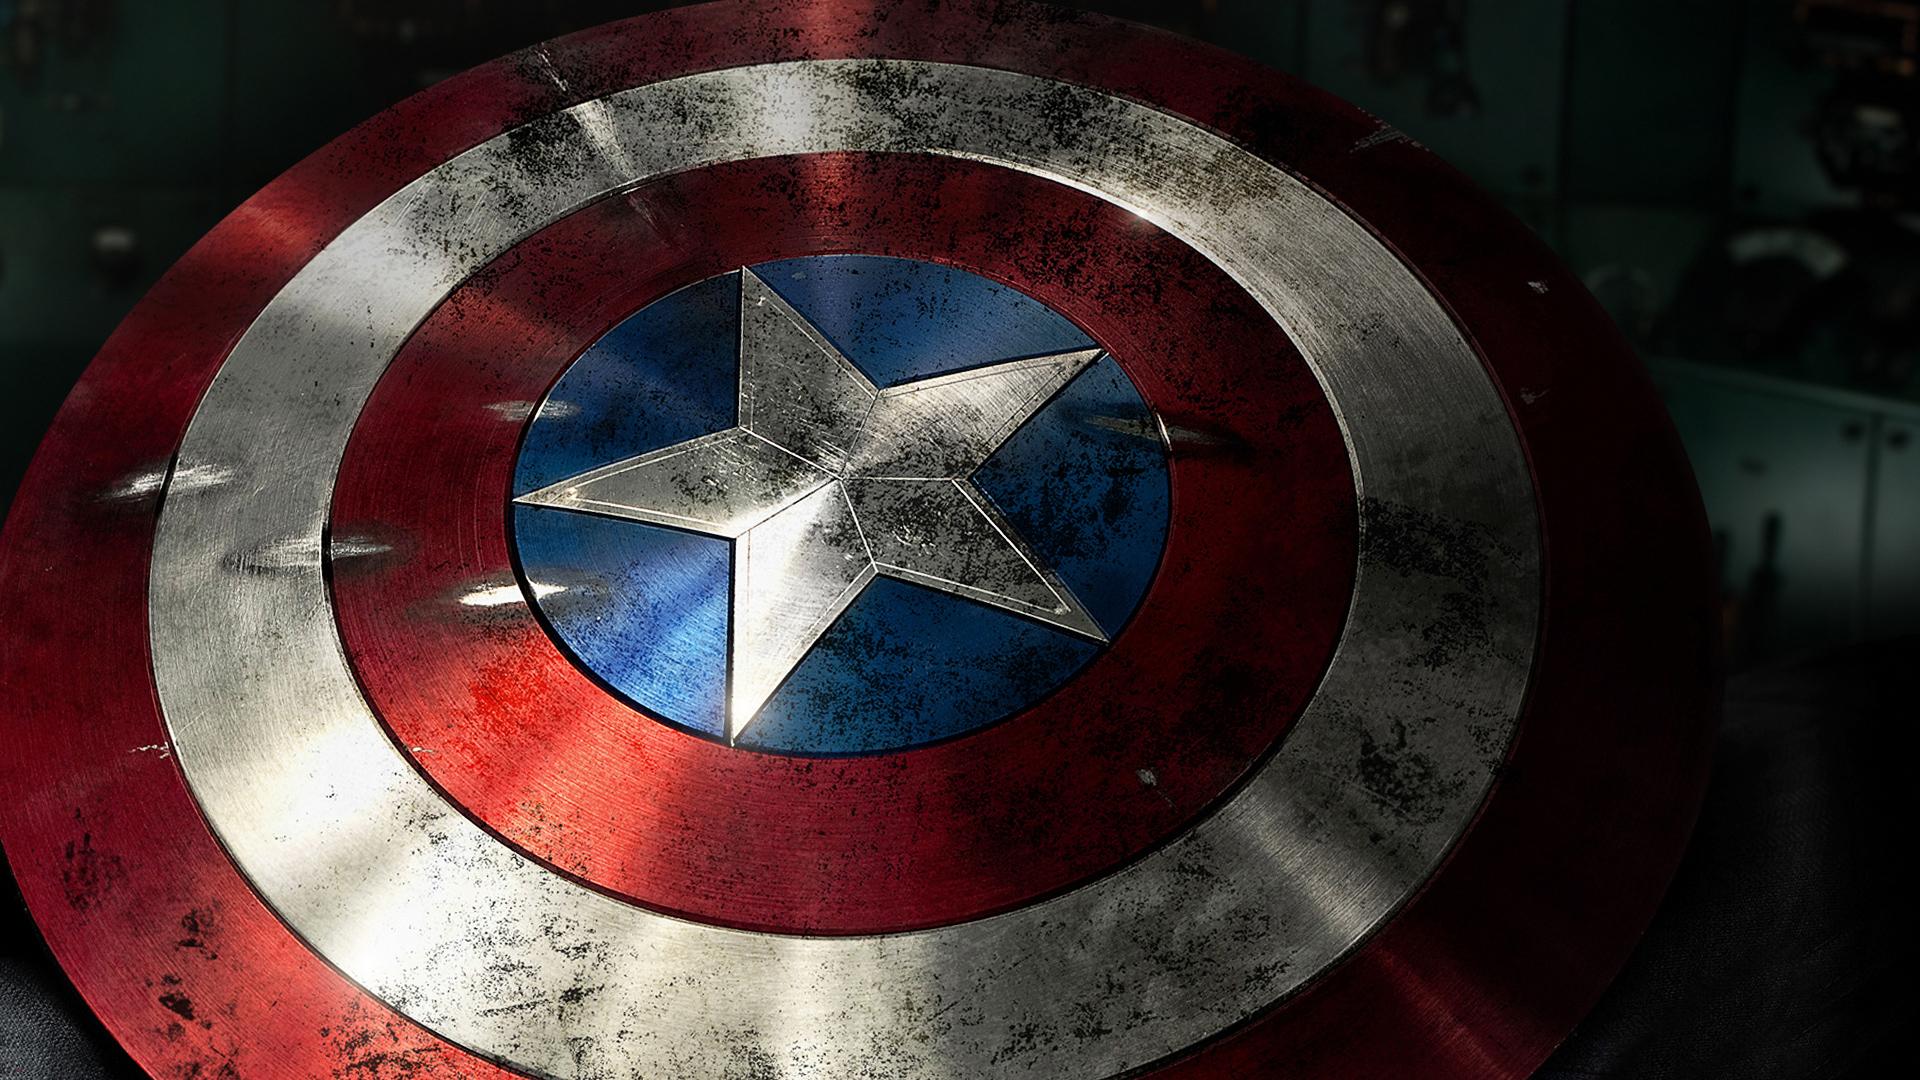 Captain America The Winter Soldier wallpaper 8